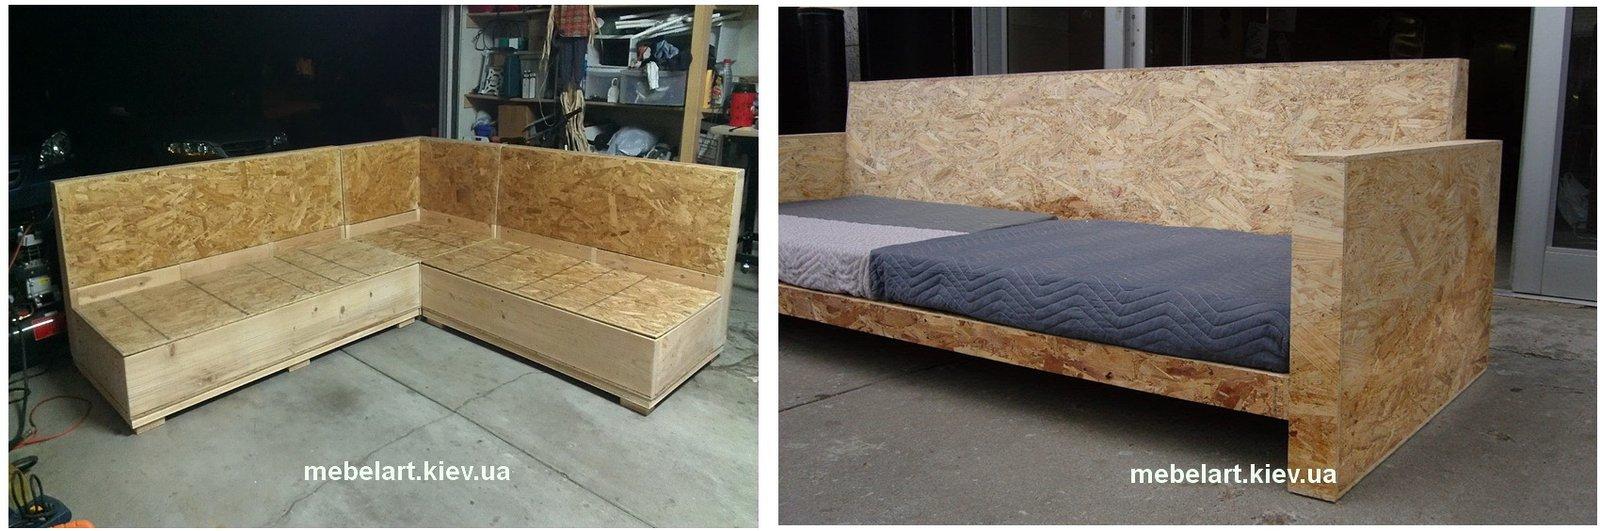 каркас для дивана из дсп